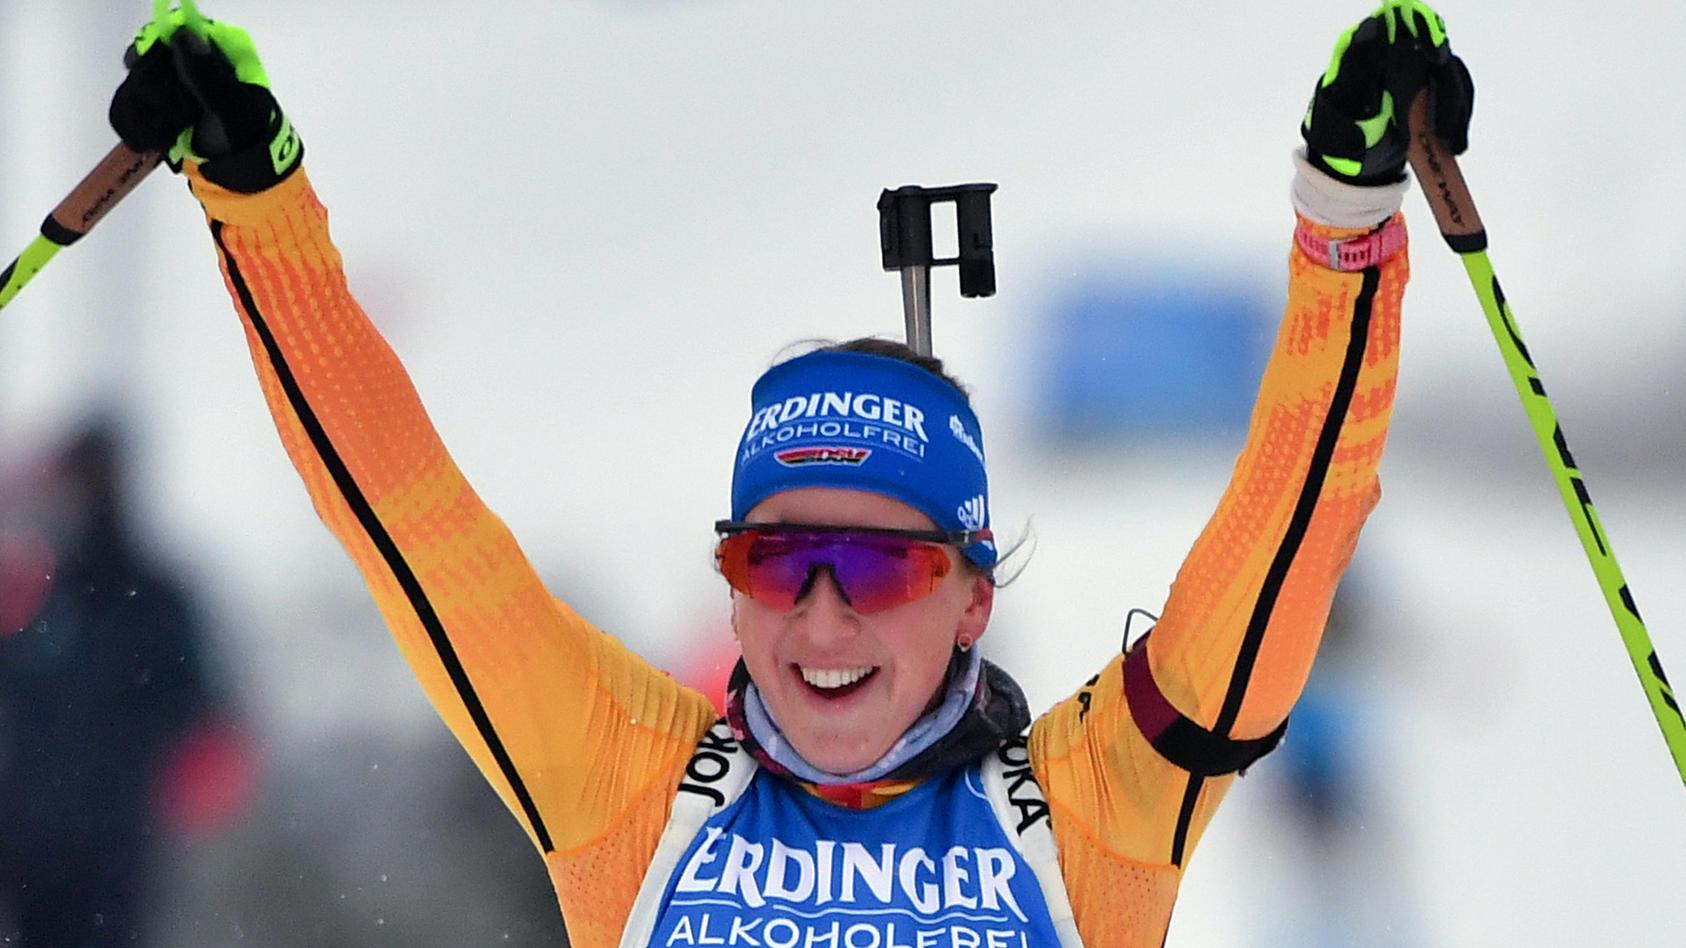 Biathlon-Weltcup in Oberhofen